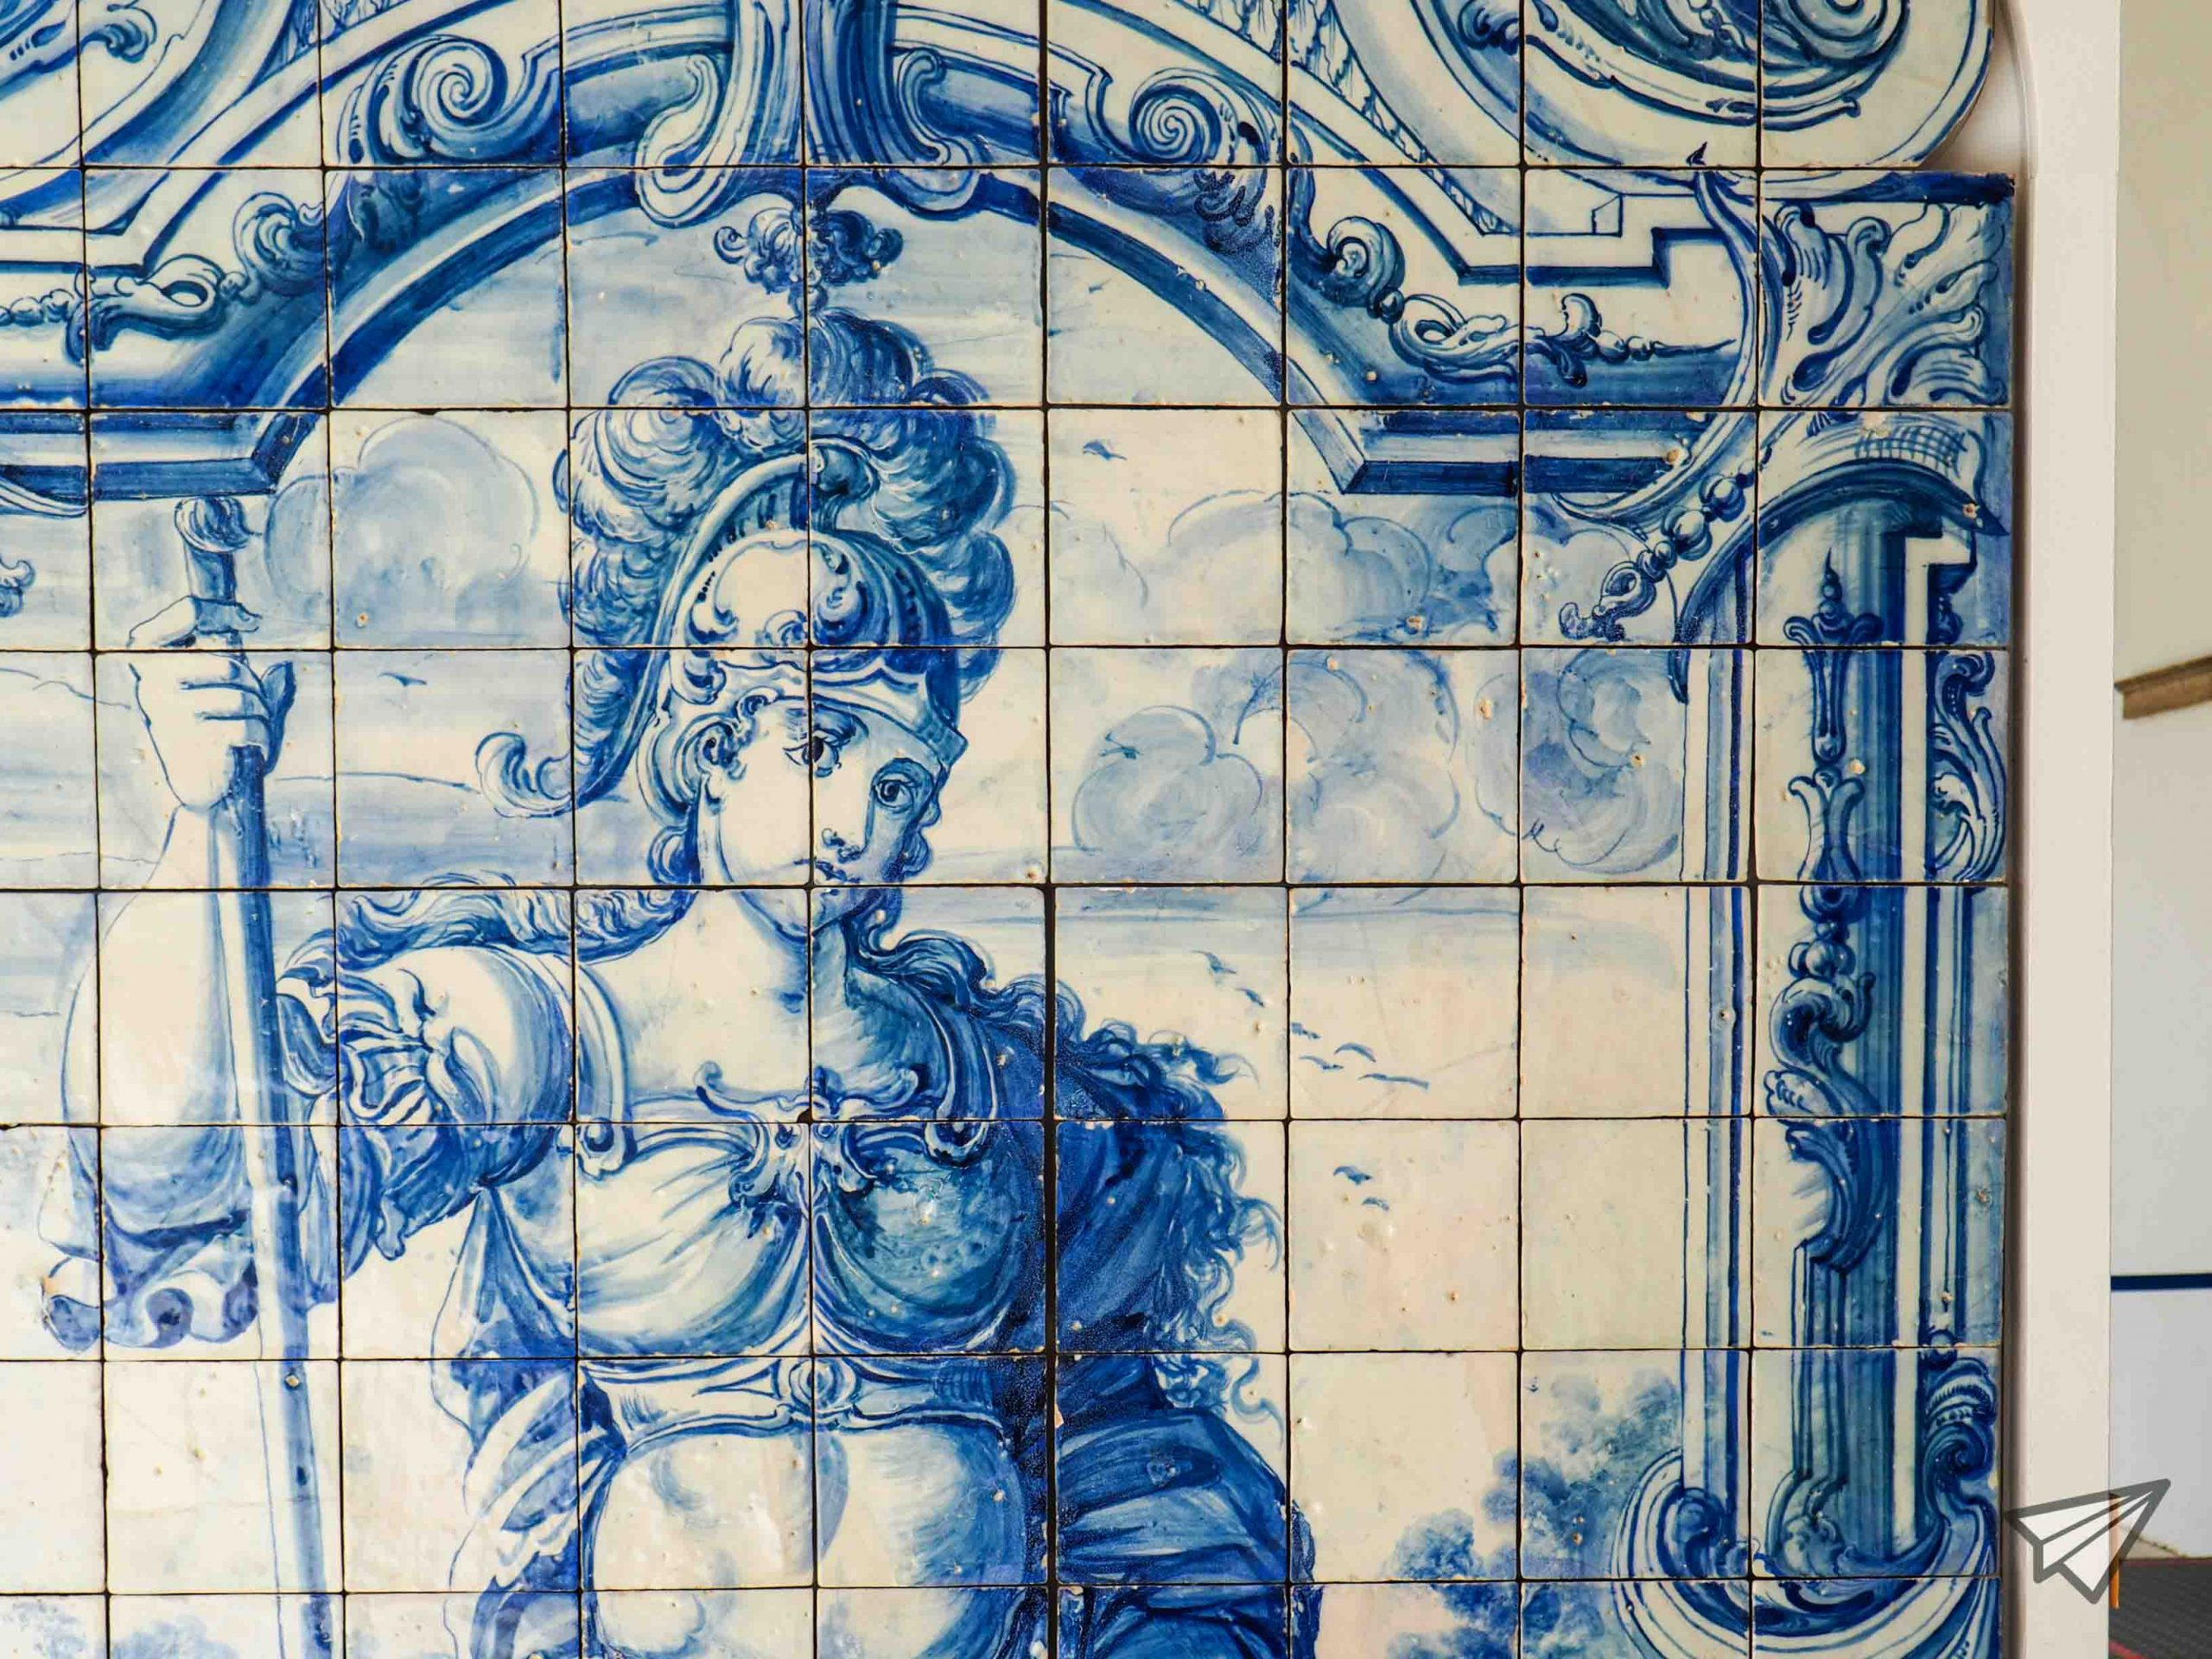 Museu Nacional do Azulejo soldier